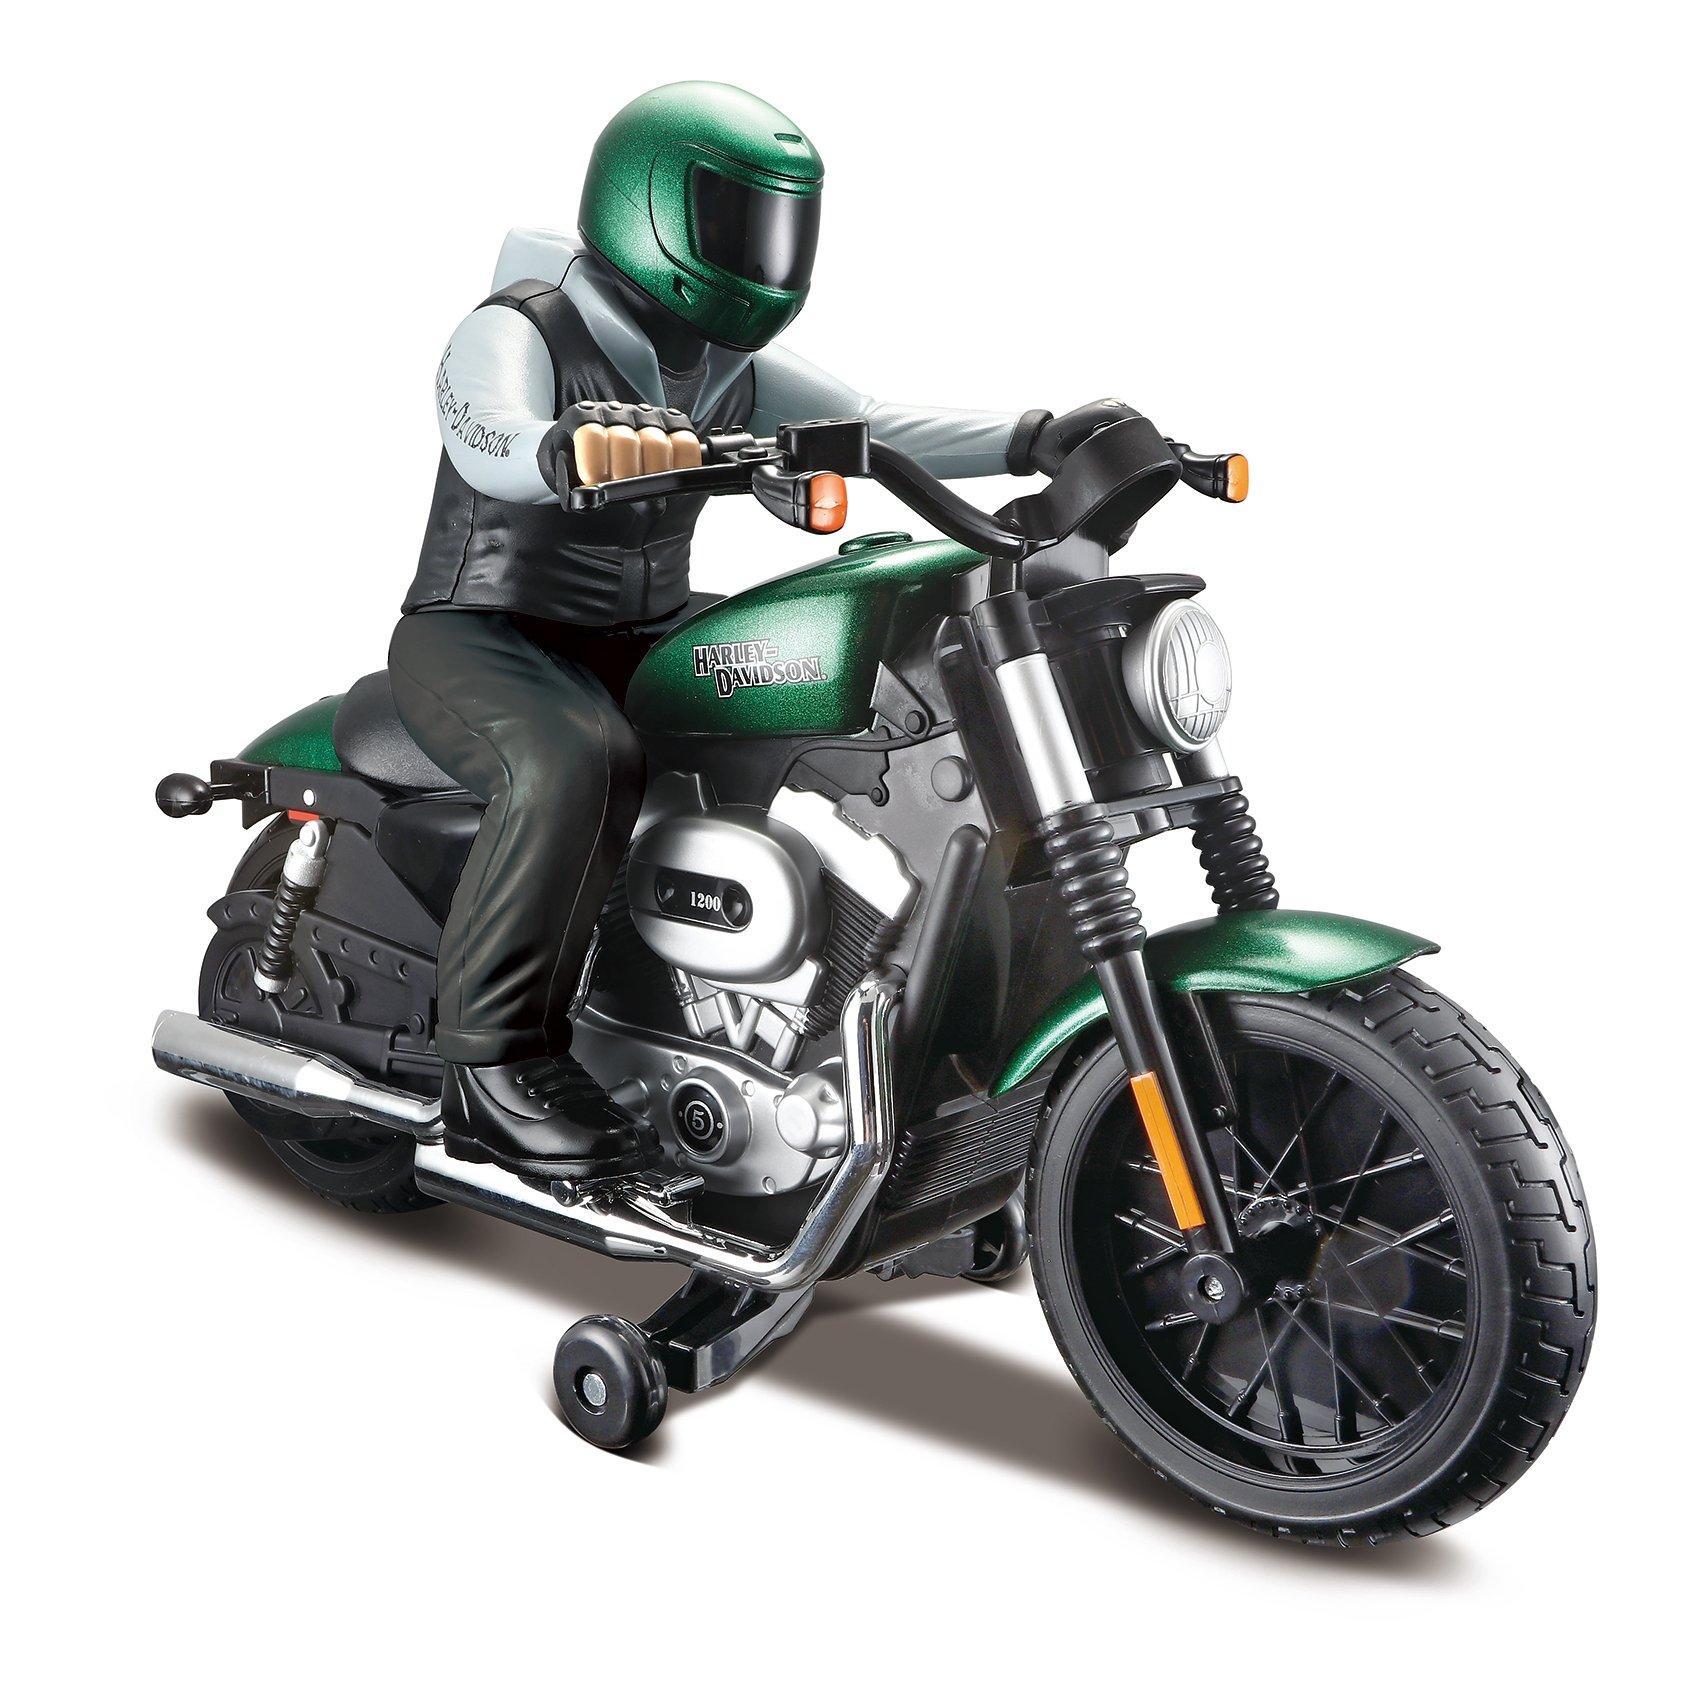 Motocicleta cu telecomanda Maisto Harley-Davidson Nightster XL 1200N, Verde